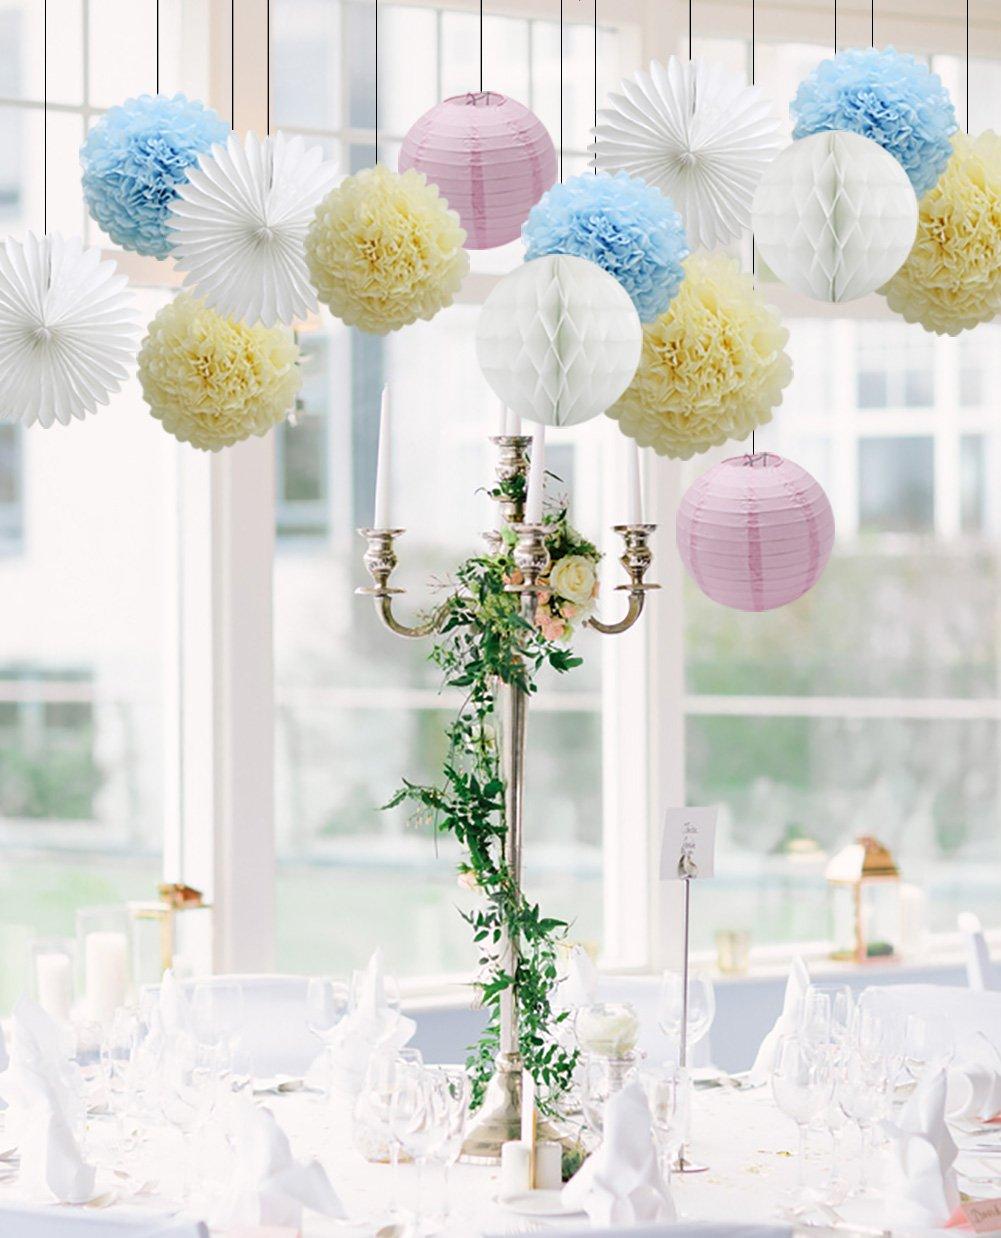 Tissue Paper Pom Pom Flowers Ball Party Decoration Kit for Birthday Wedding Celebration Assorted 01